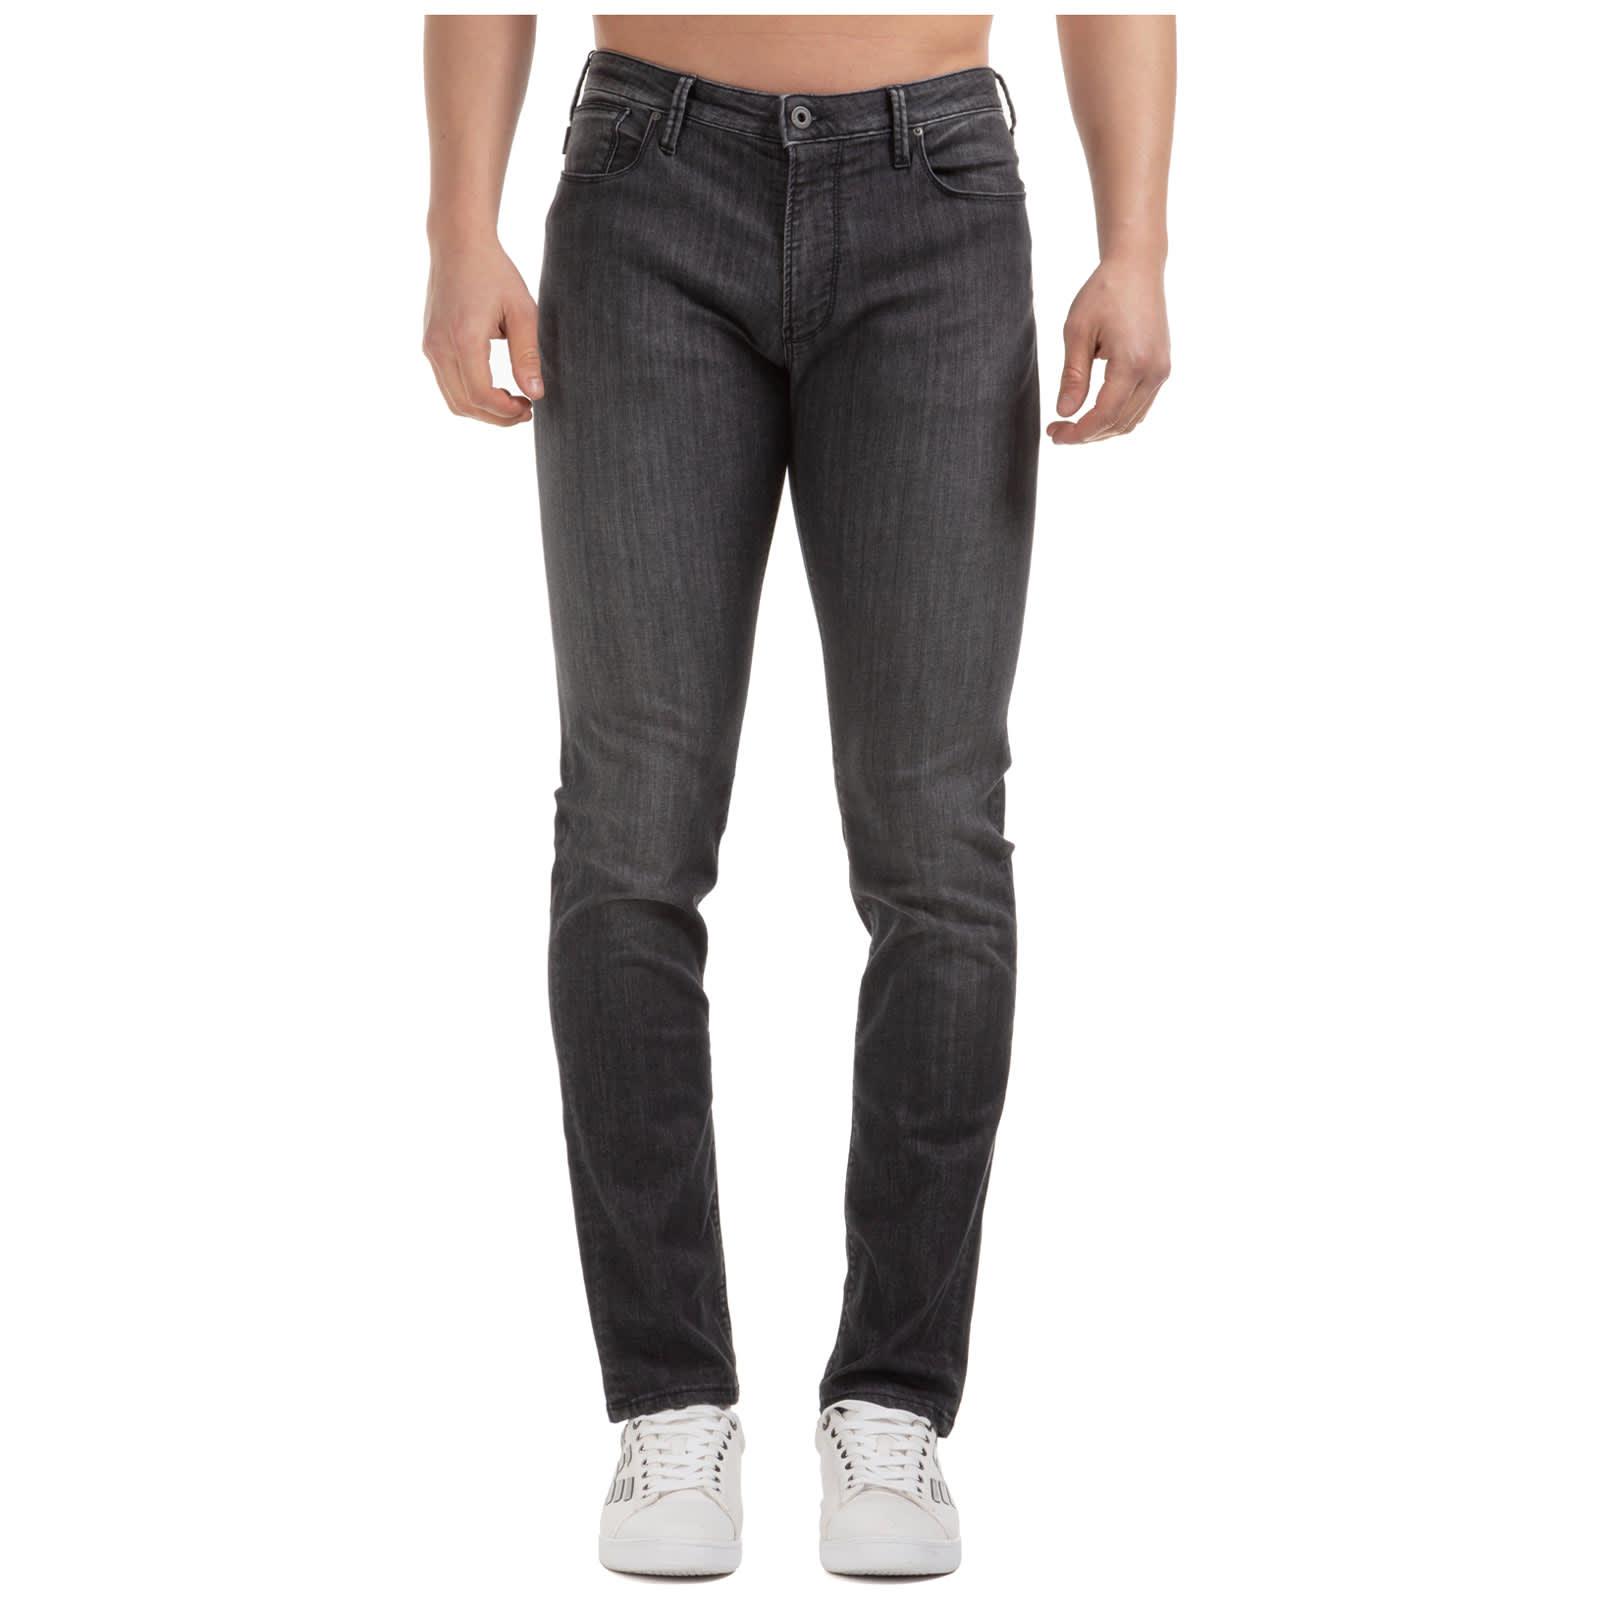 Pandora Jeans